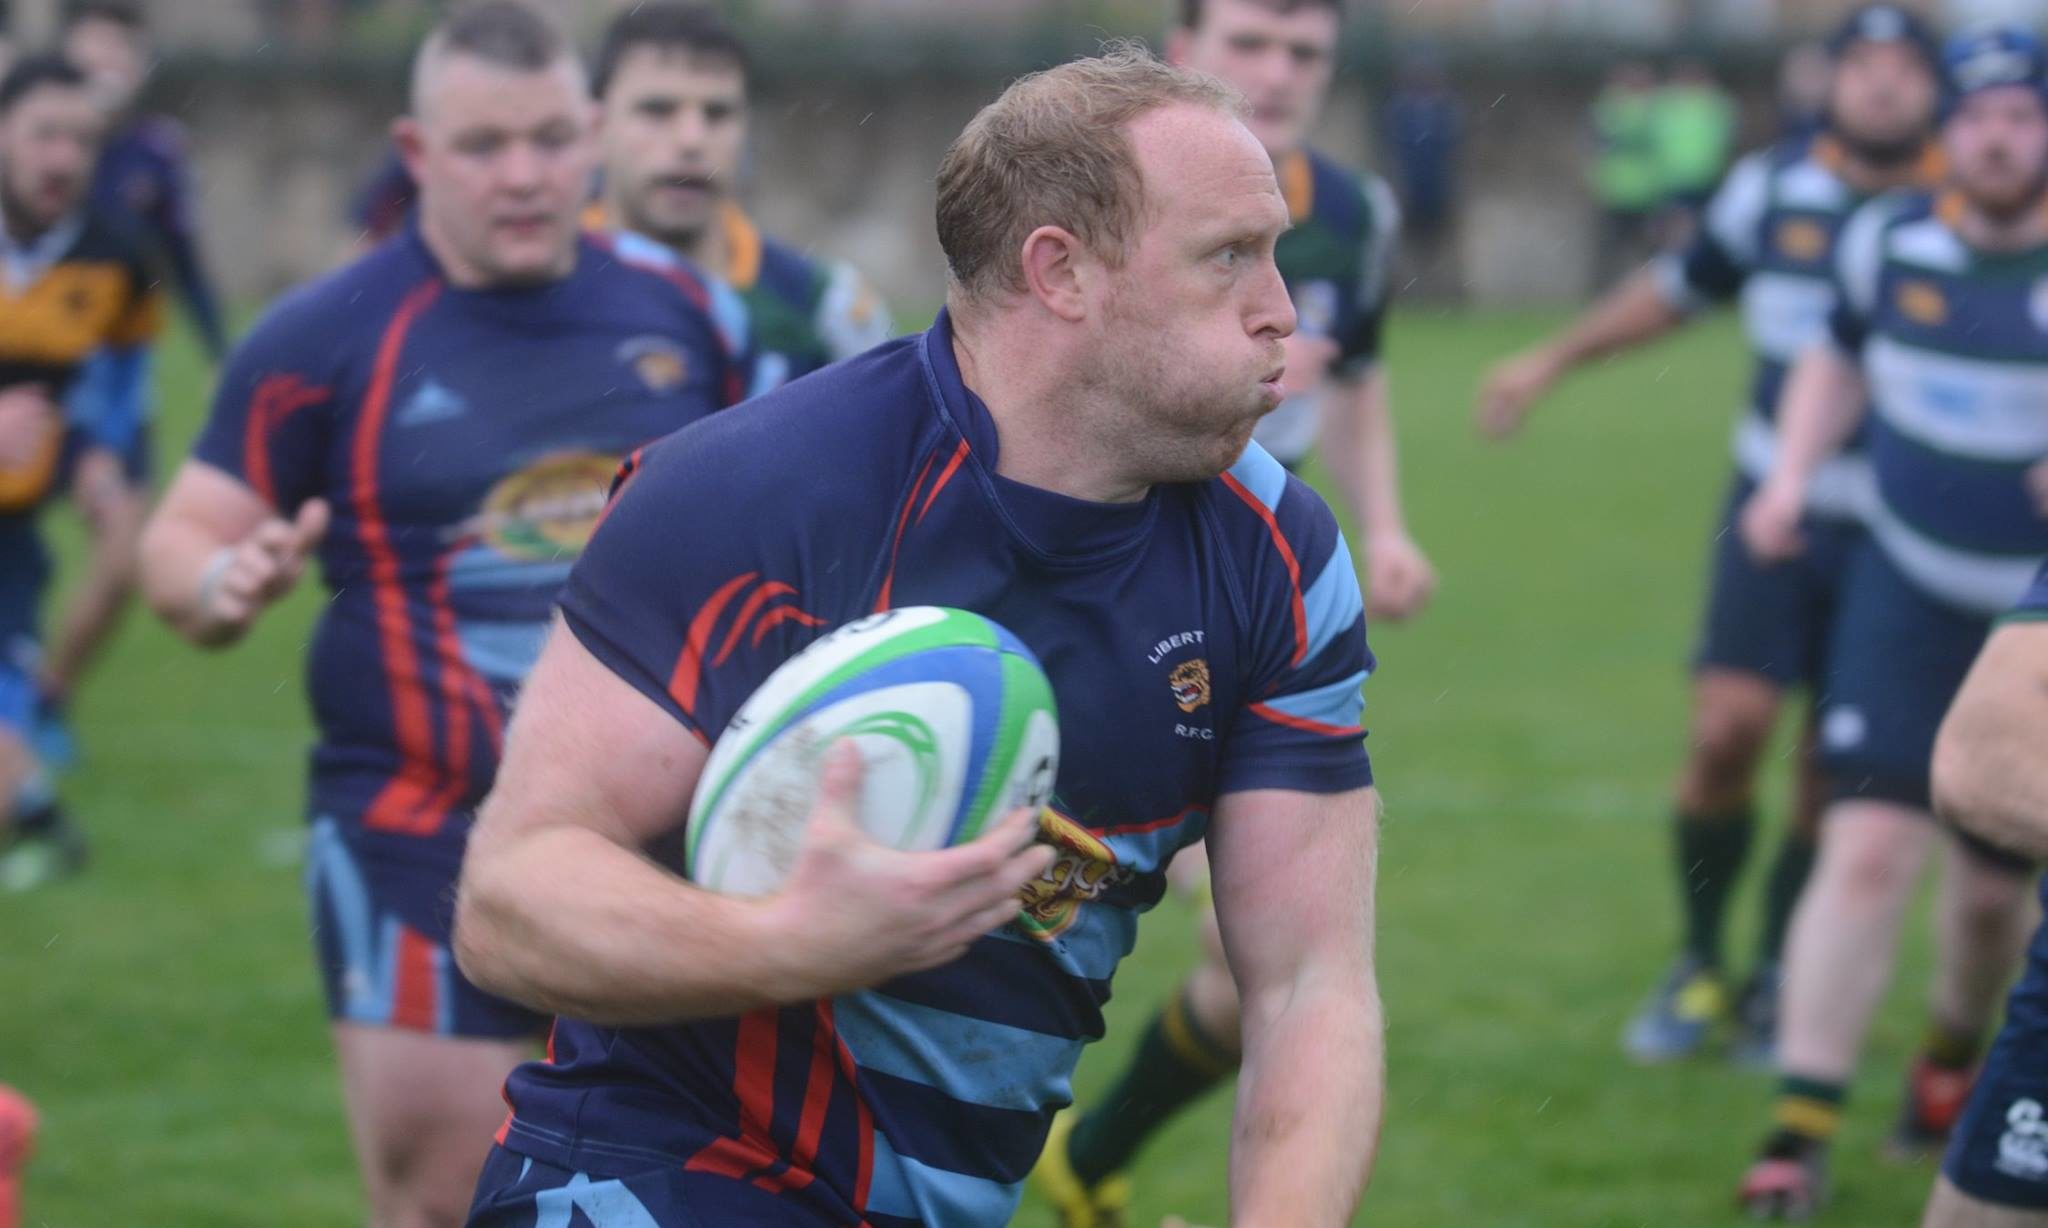 Jonny Clipston plays for Liberton Rugby Club in Edinburgh